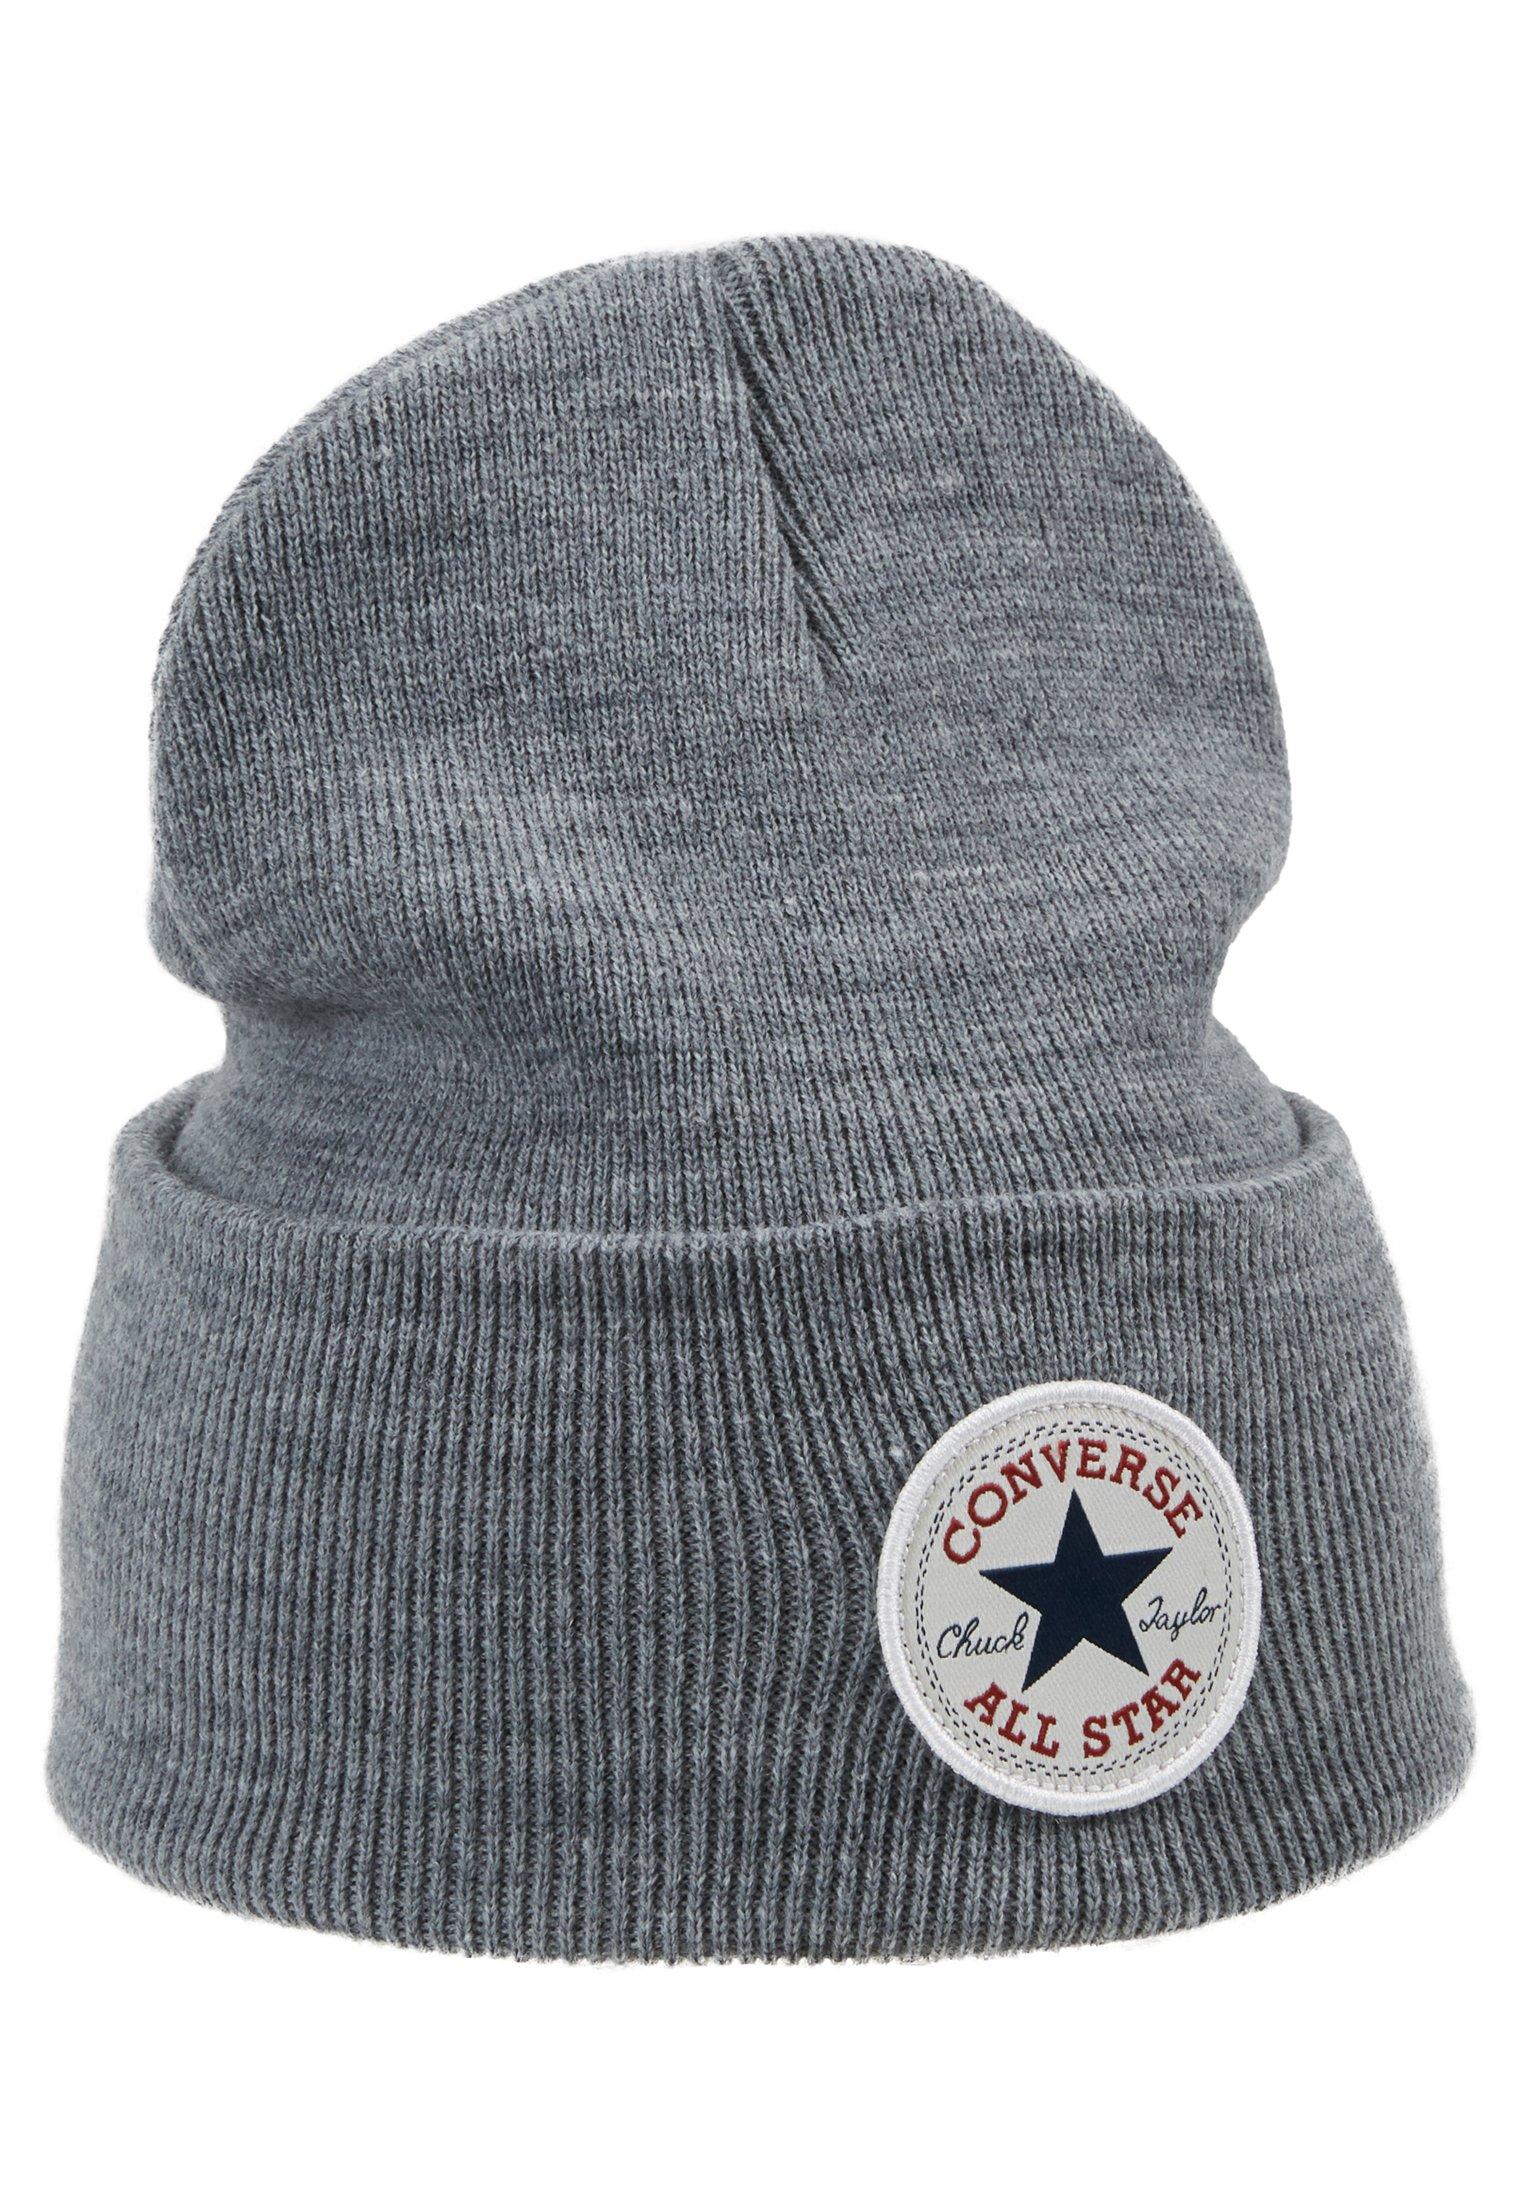 Converse Chuck Patch Tall Beanie - Mütze Vintage Grey Heathered/grau